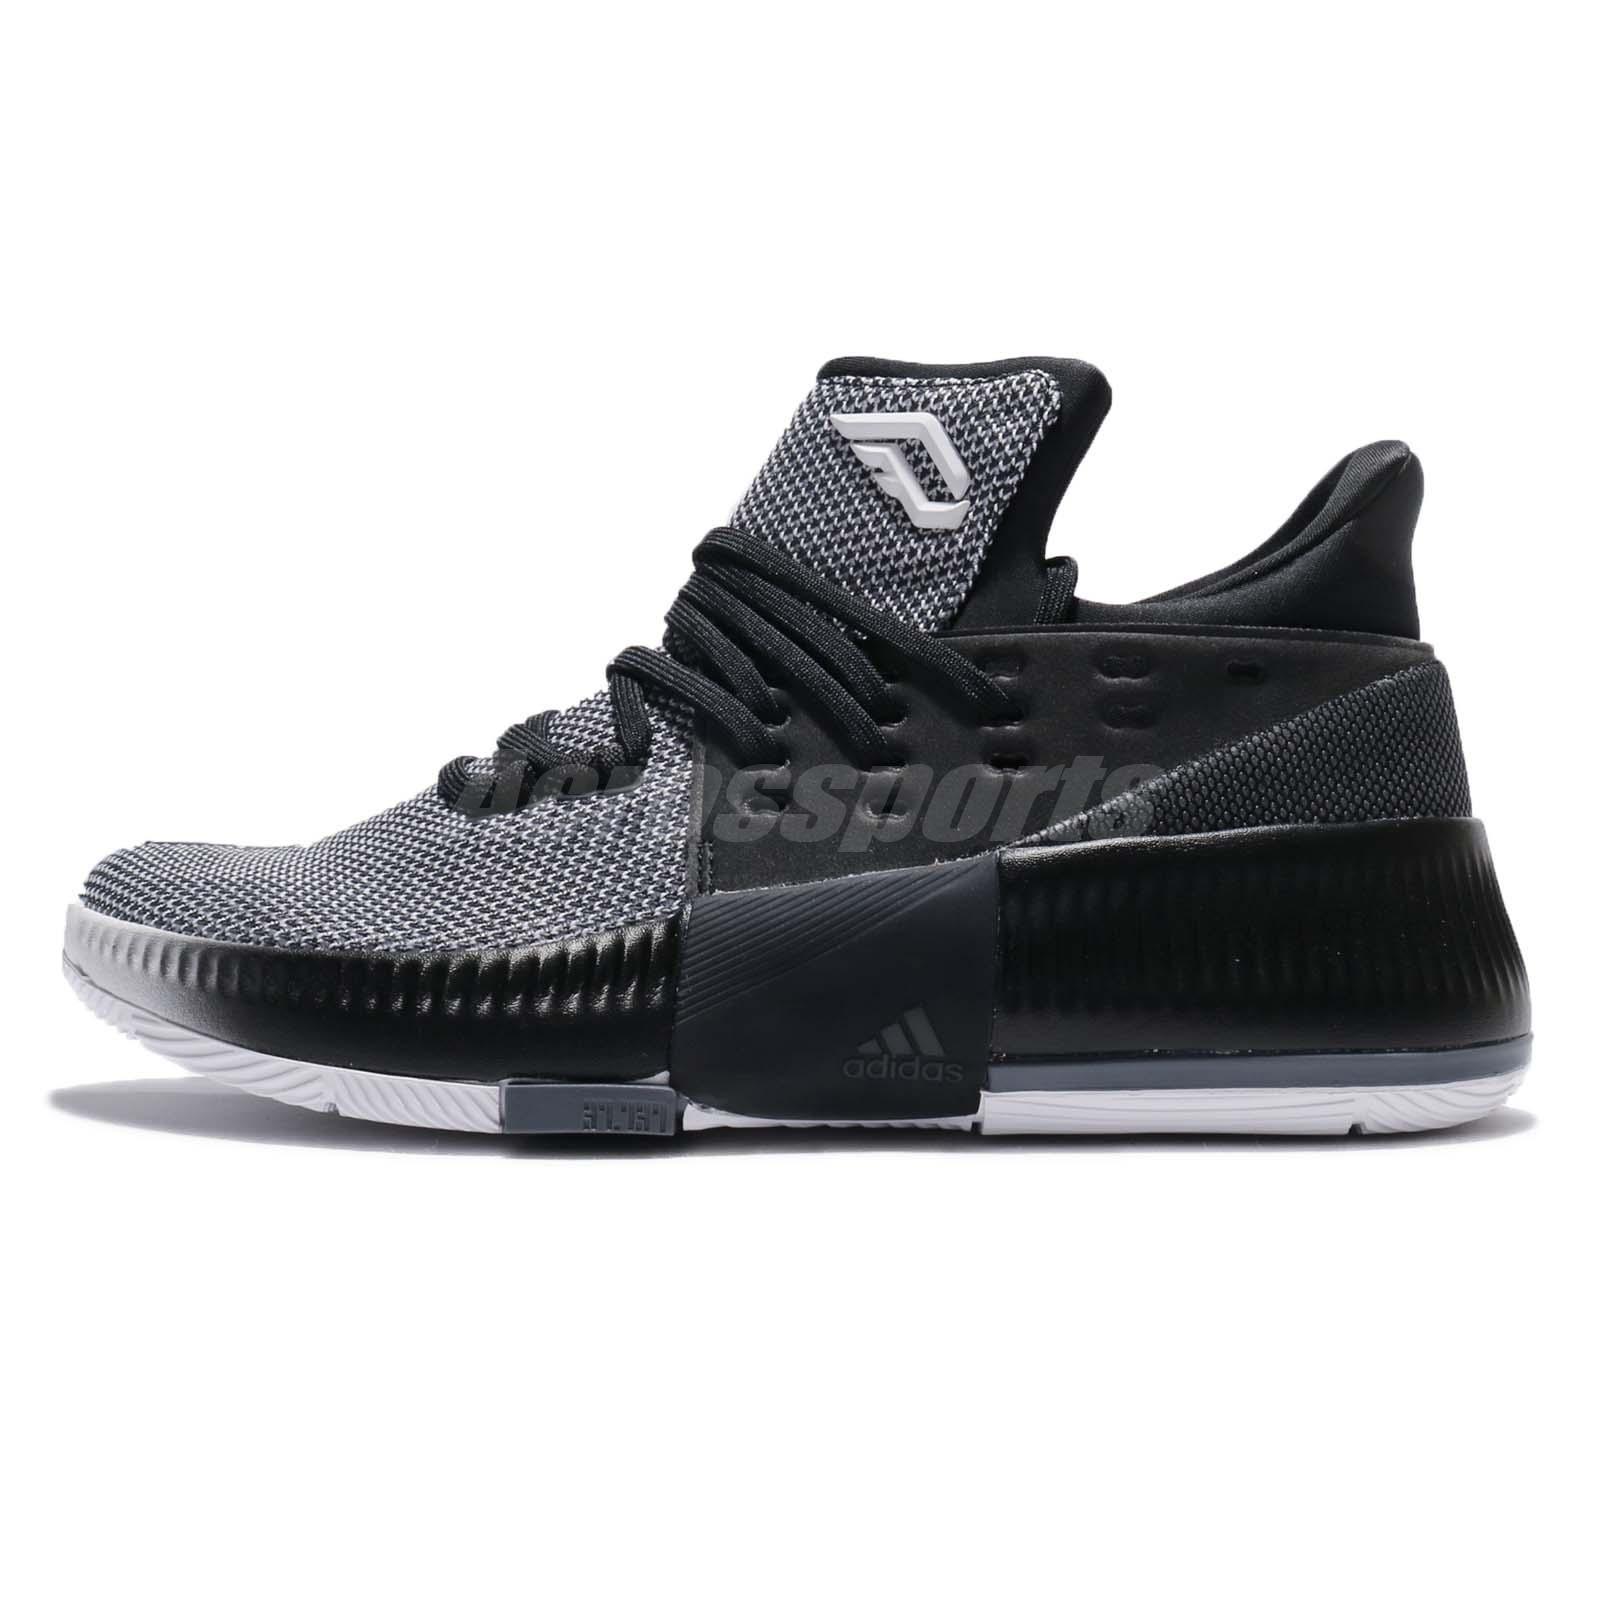 on sale cf7cd 58c0c ... amazon adidas dame 3 j damian lillard black white kids boys basketball  shoes cg4228 cd3f5 68531